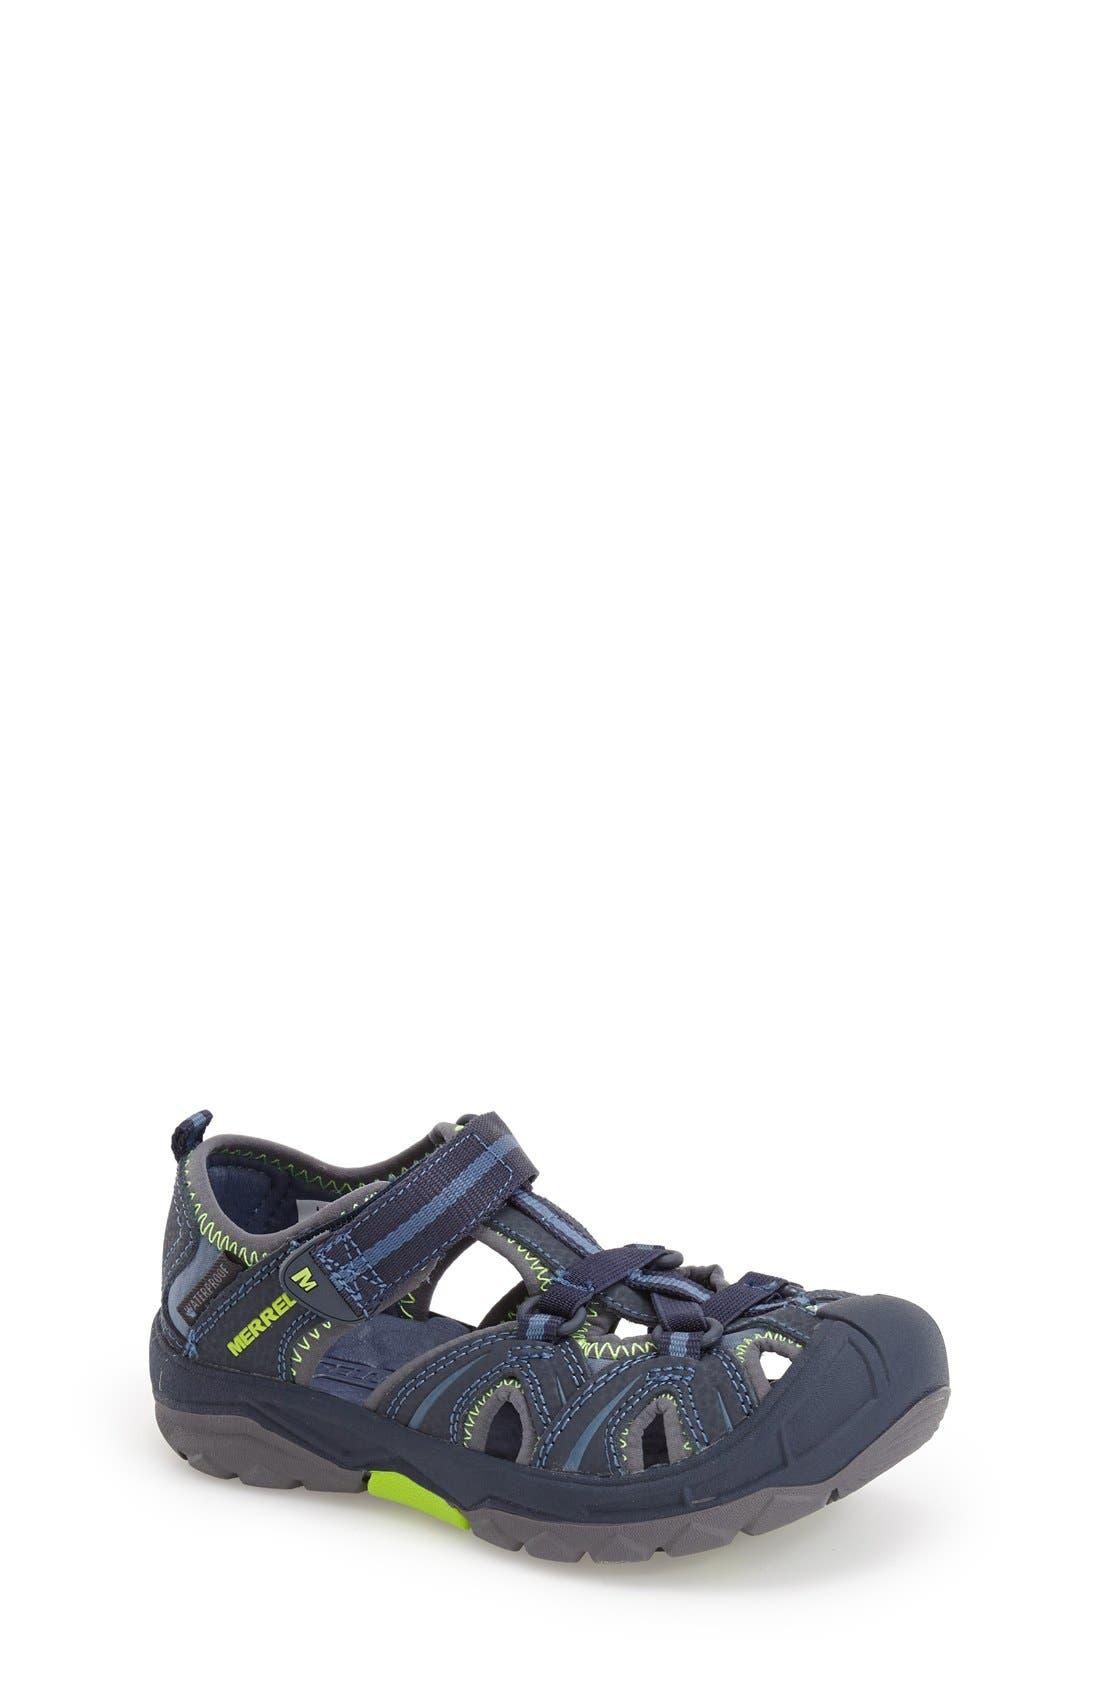 MERRELL 'Hydro' Water Sandal